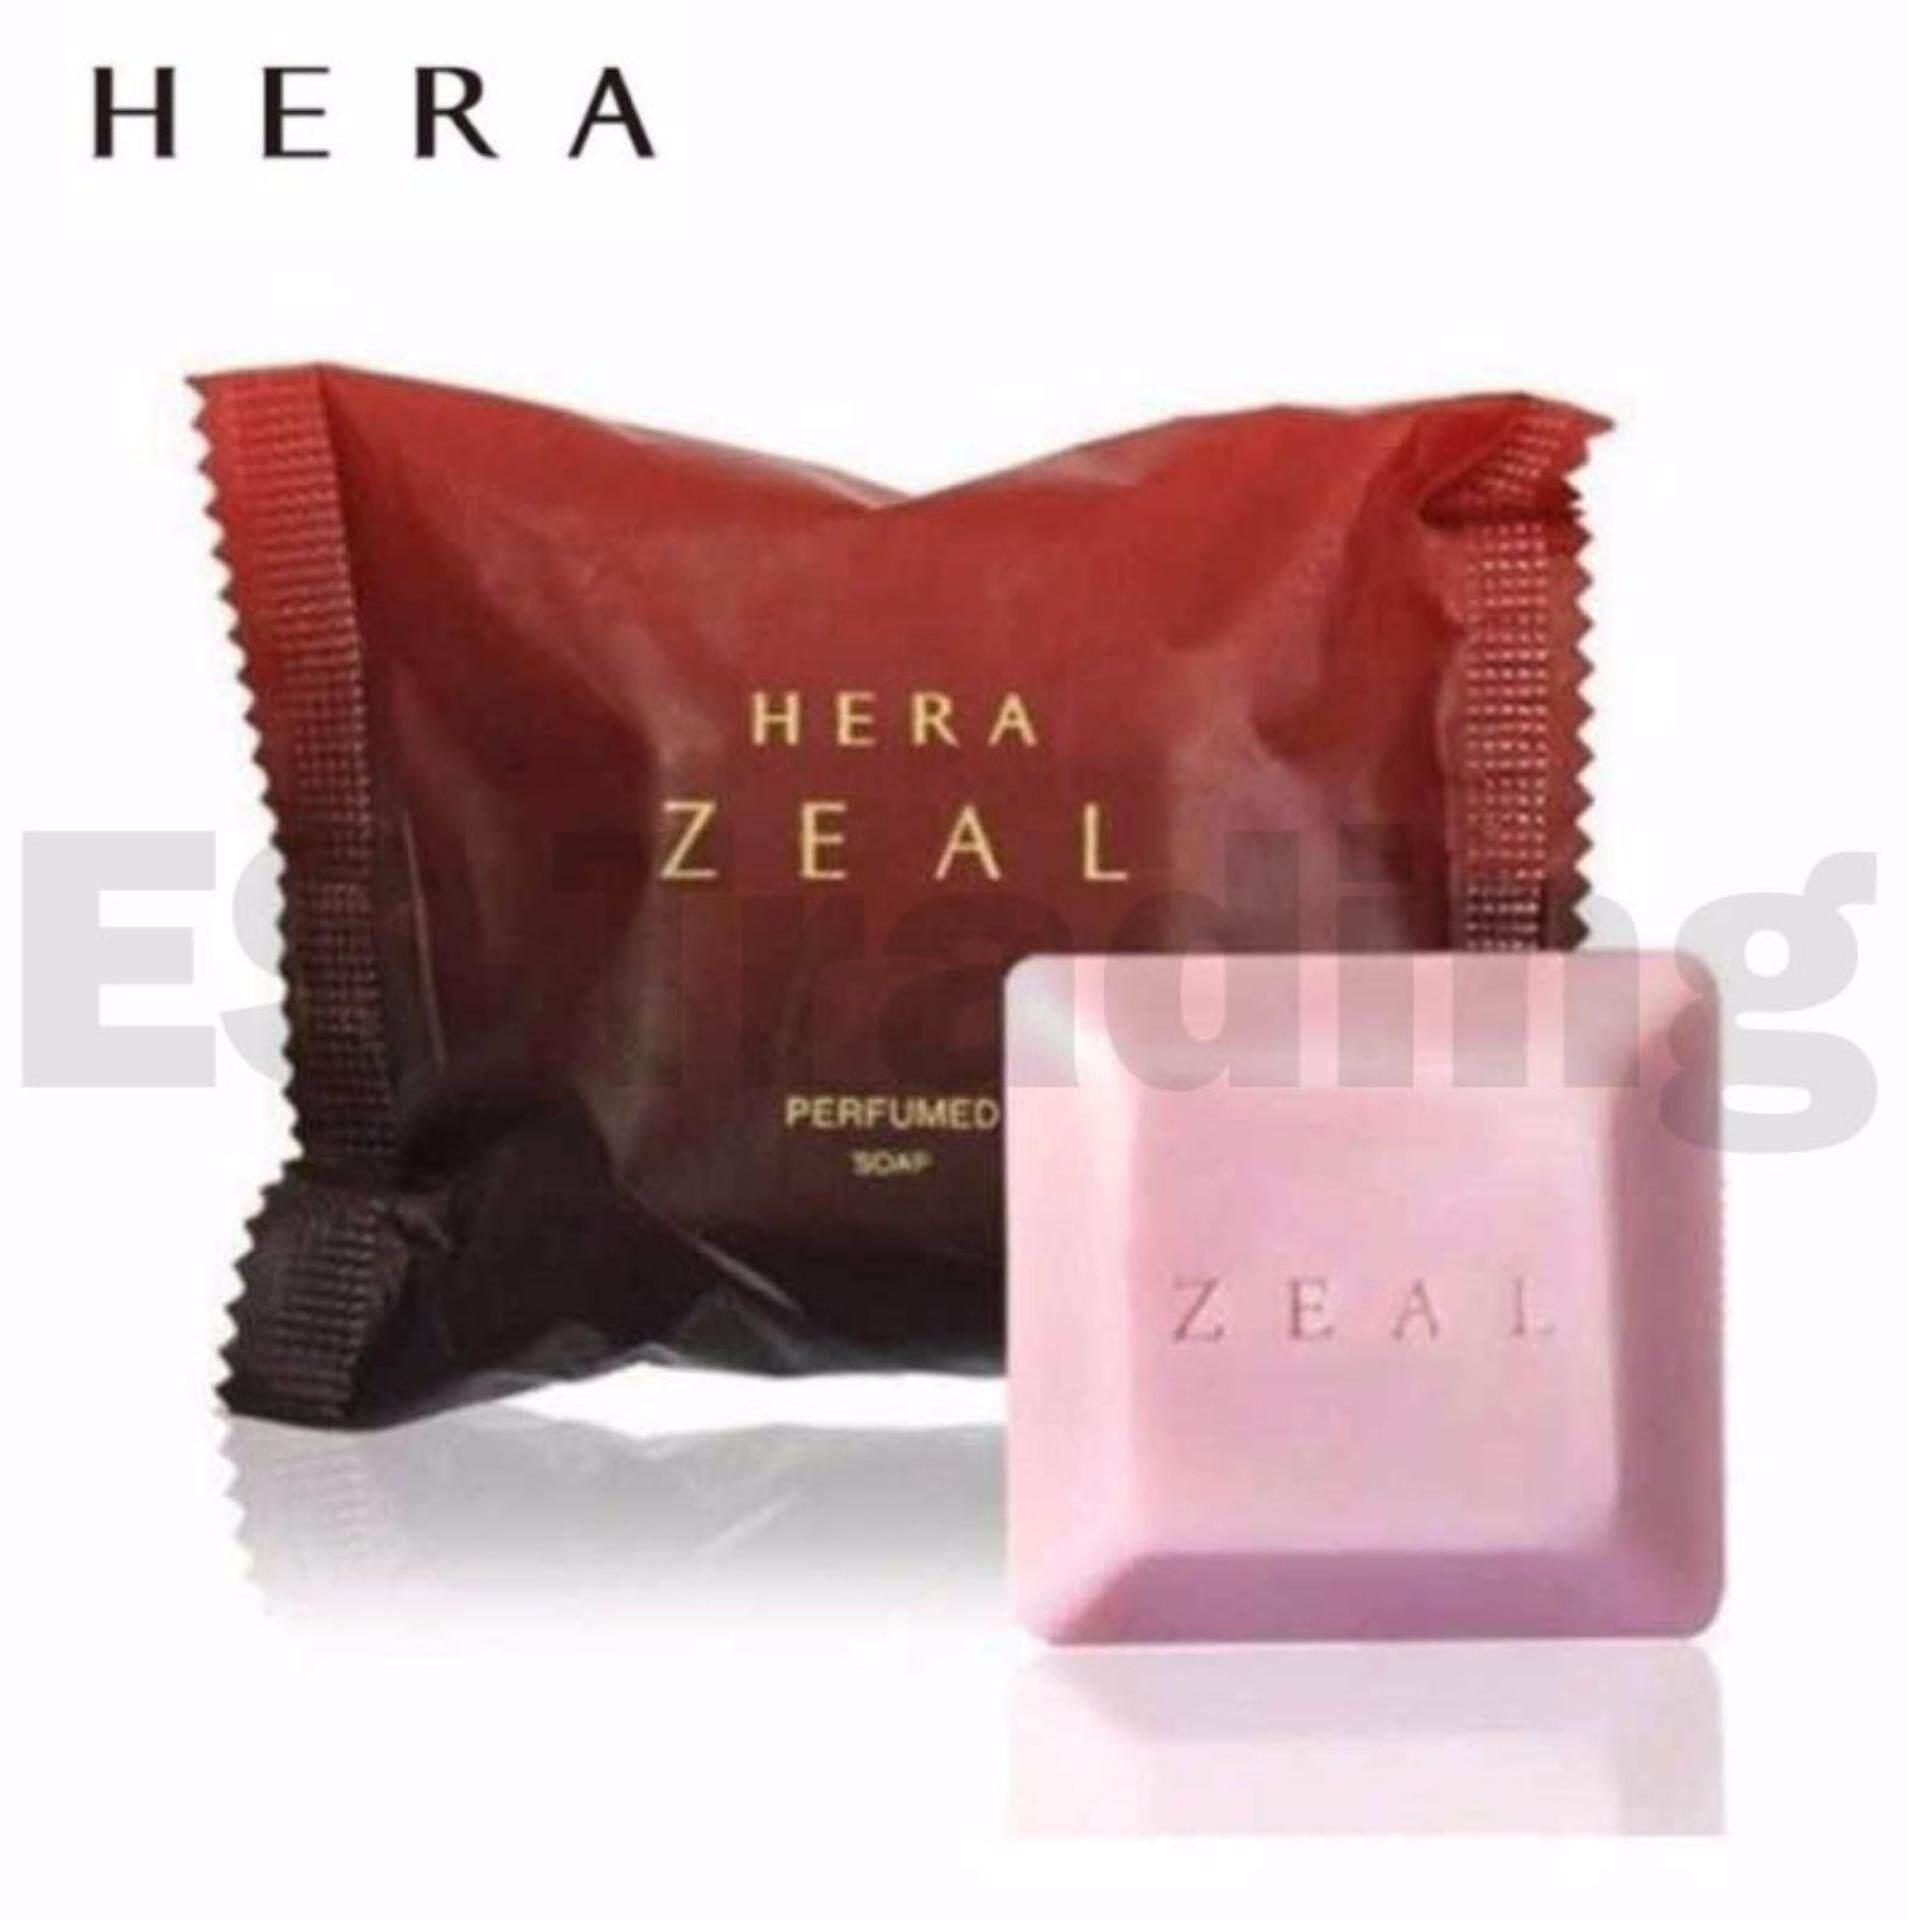 HERA Zeal Perfumed Soap 50g image